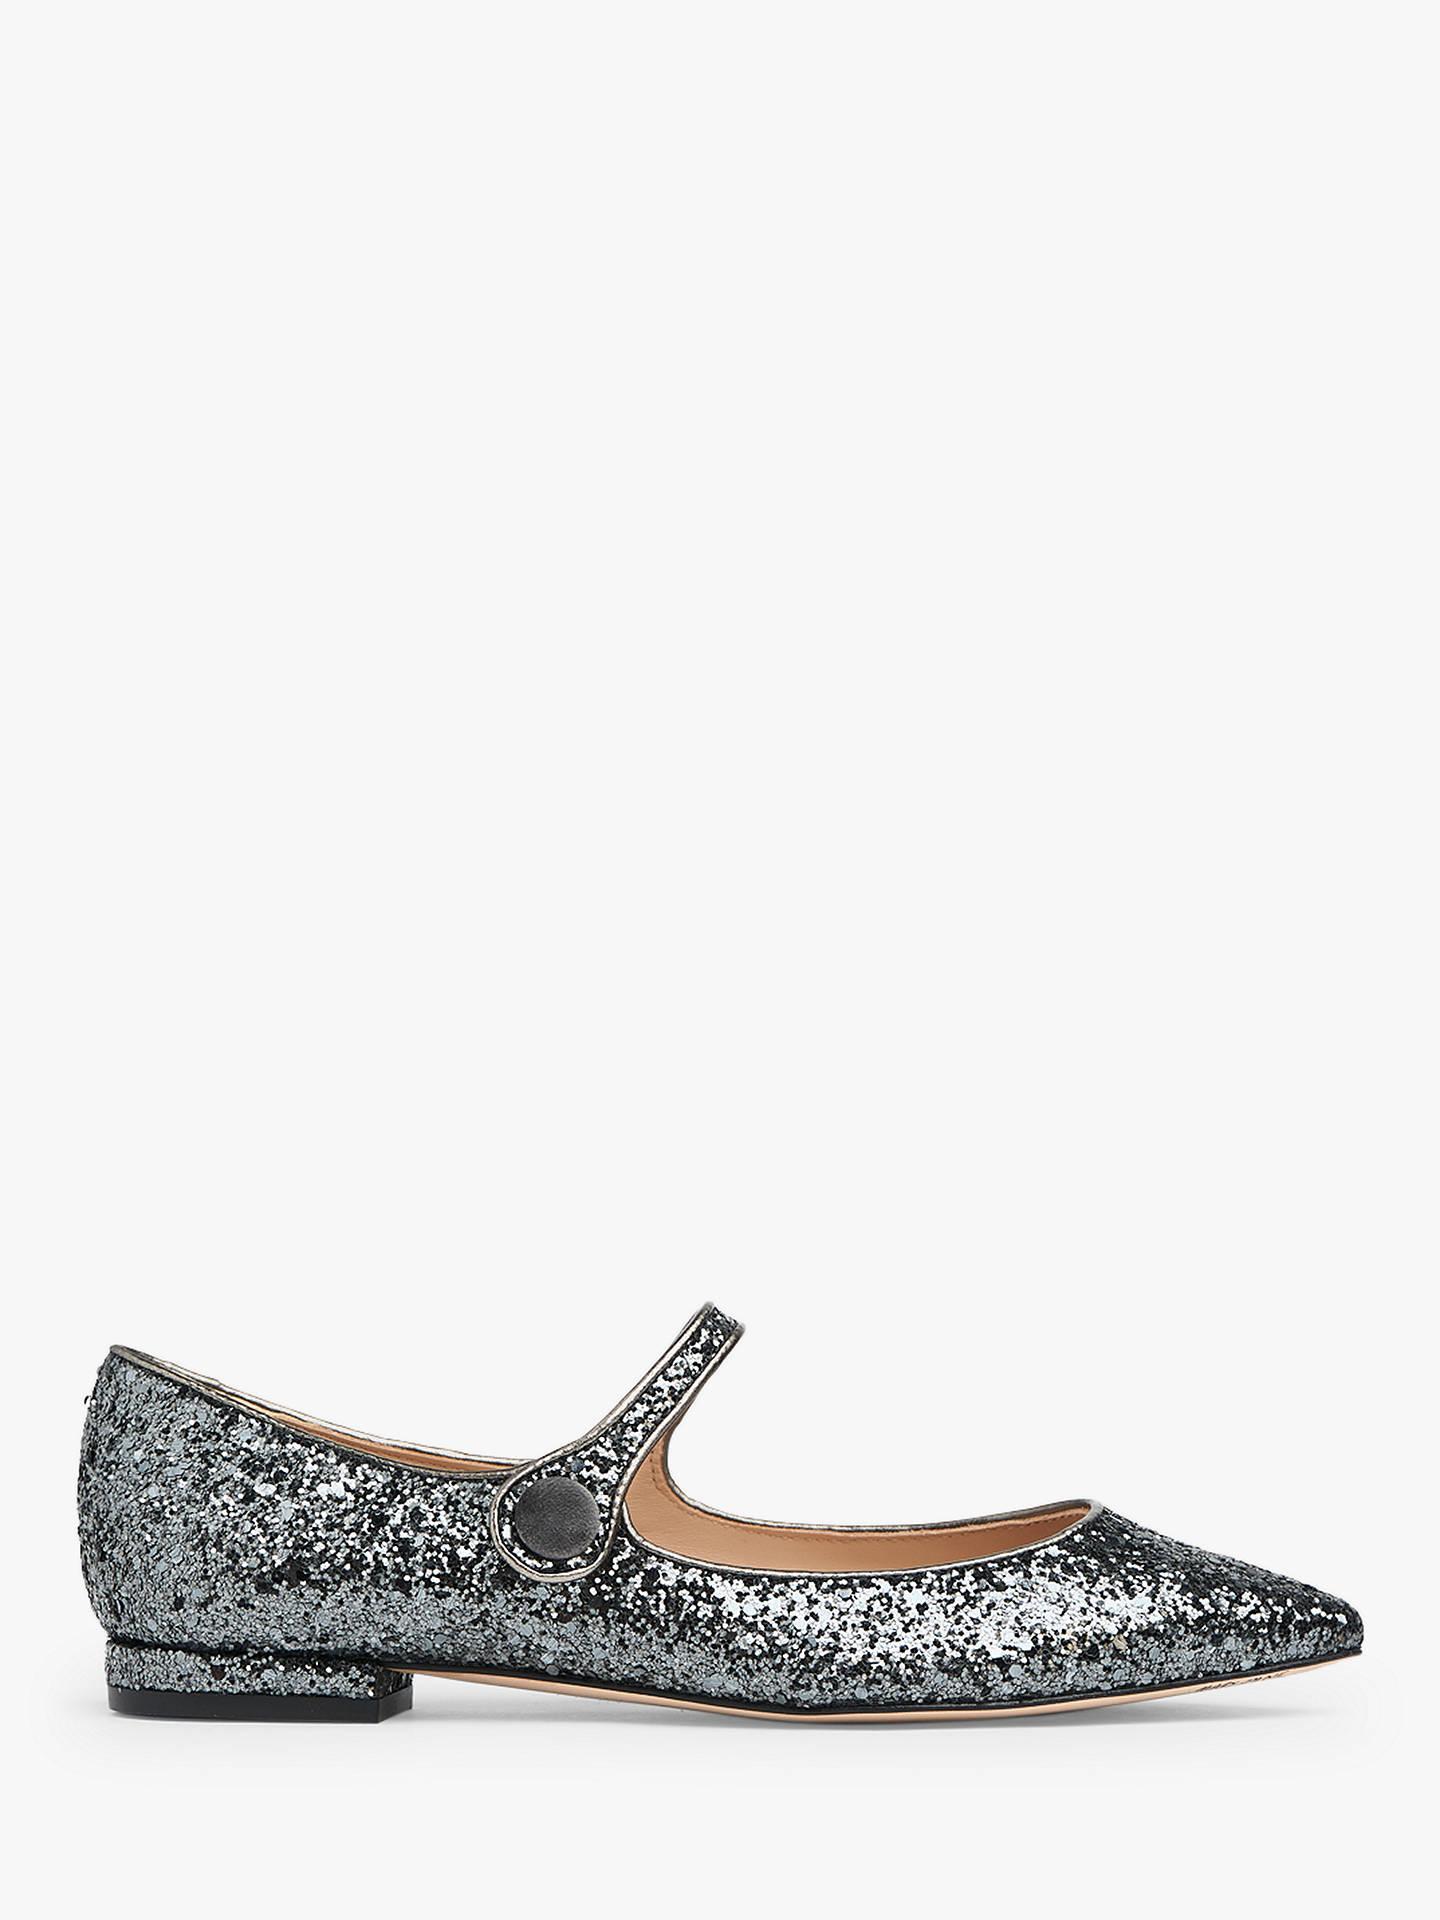 6fe8f7ec8373c L.K.Bennett Mary-Jane Flat Shoes, Charcoal Glitter at John Lewis ...